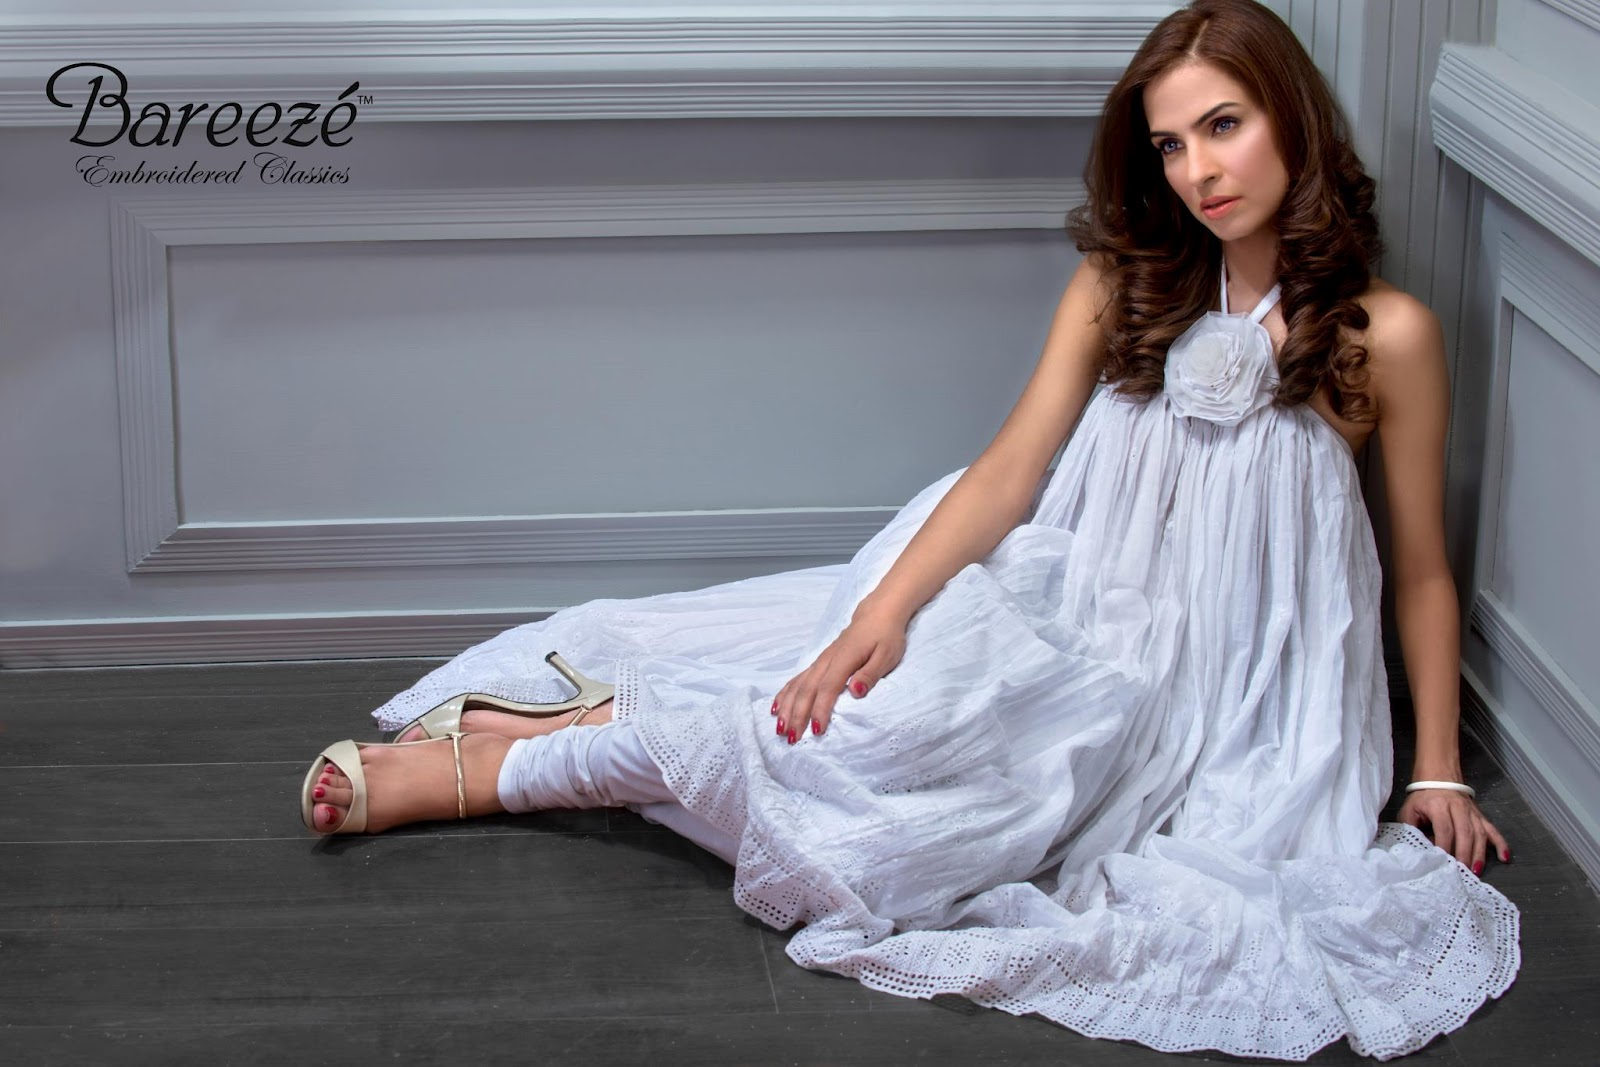 Bareeze live dresses gallery bareeze fashion brand photos designs - Wednesday 29 August 2012